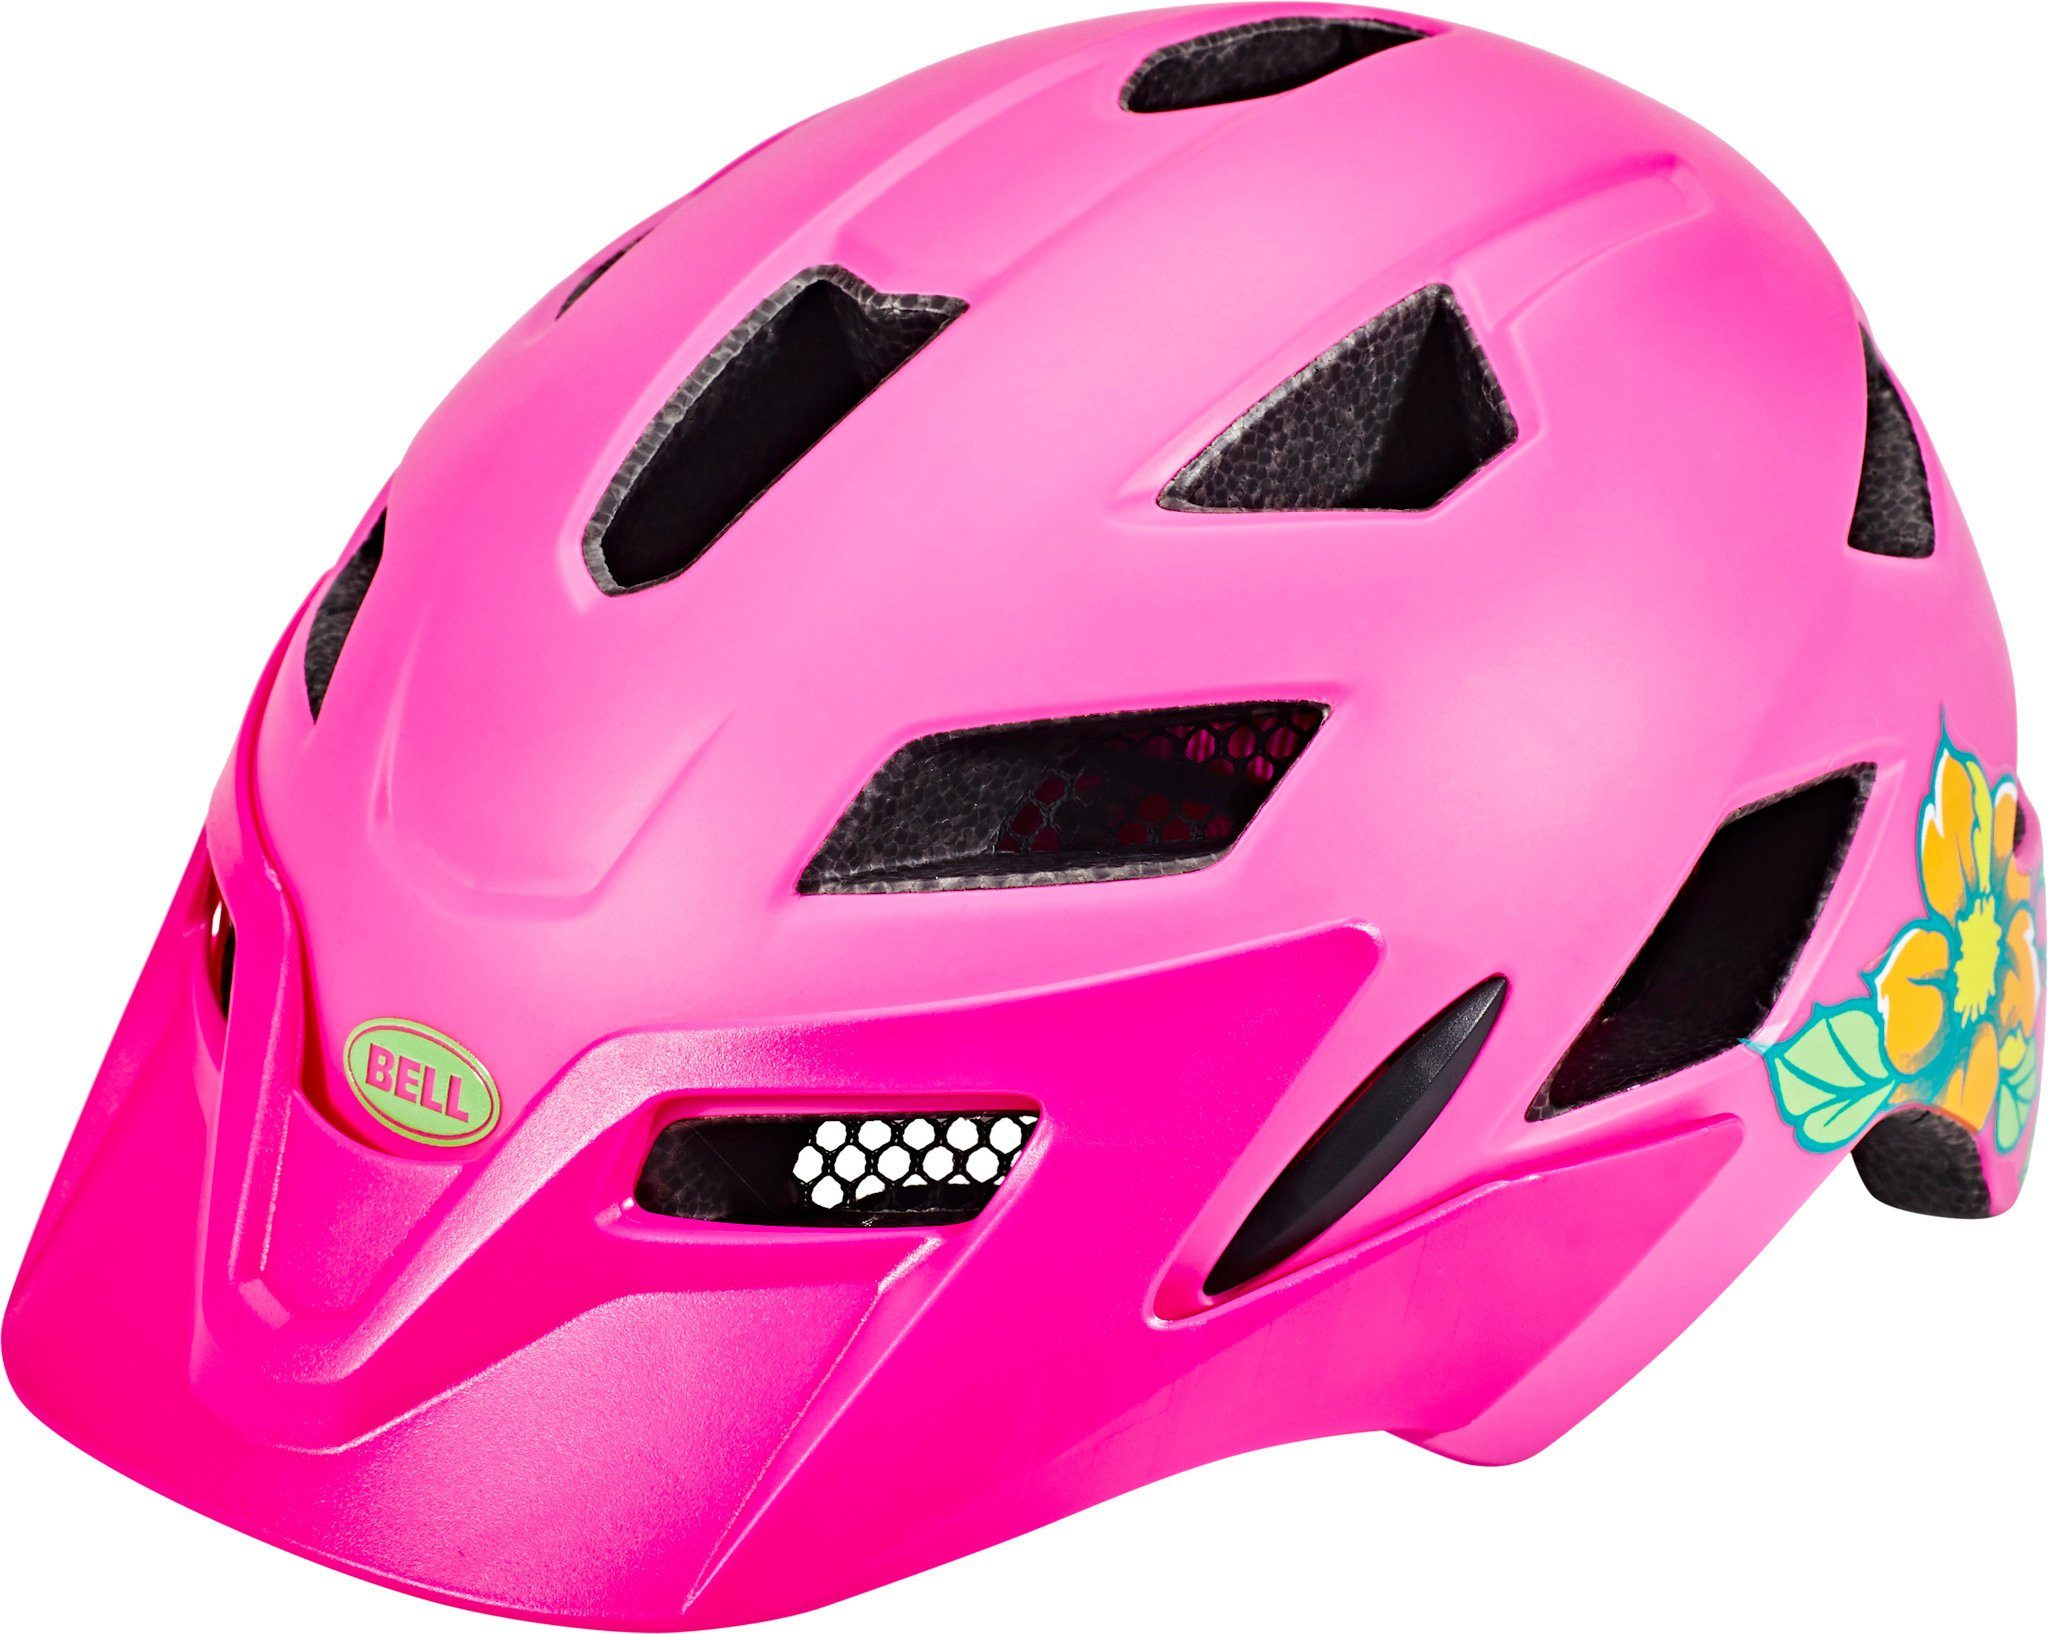 Bell Fahrradhelm »Sidetrack Helmet Child«